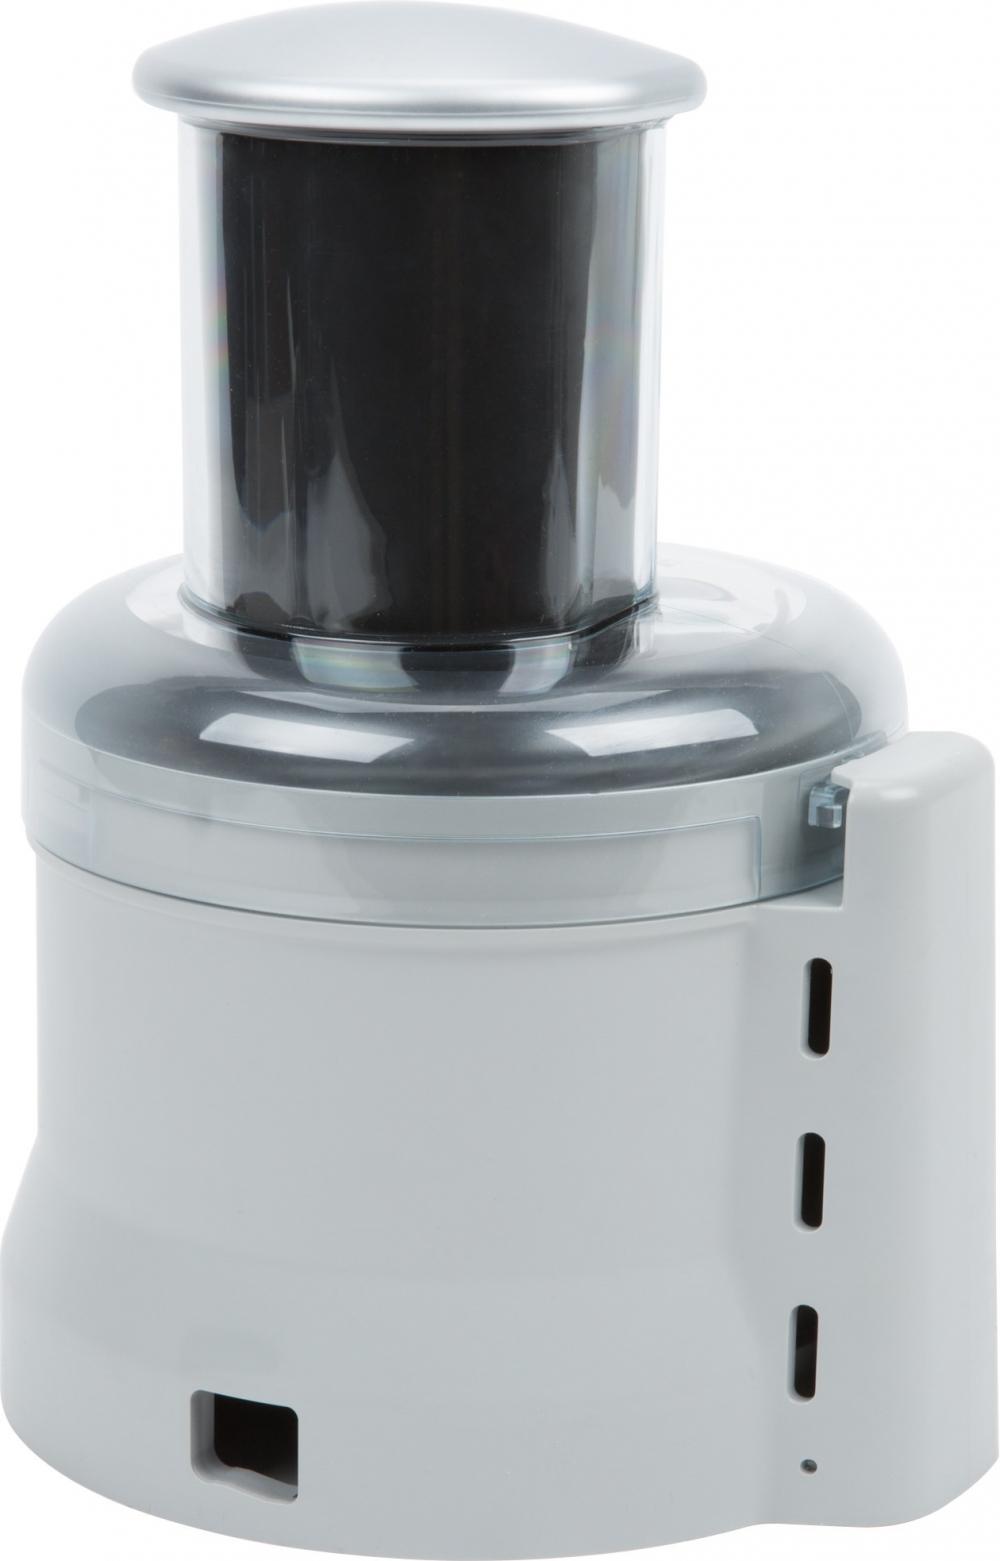 Кулинарный набор Robot Coupe27396 - 4